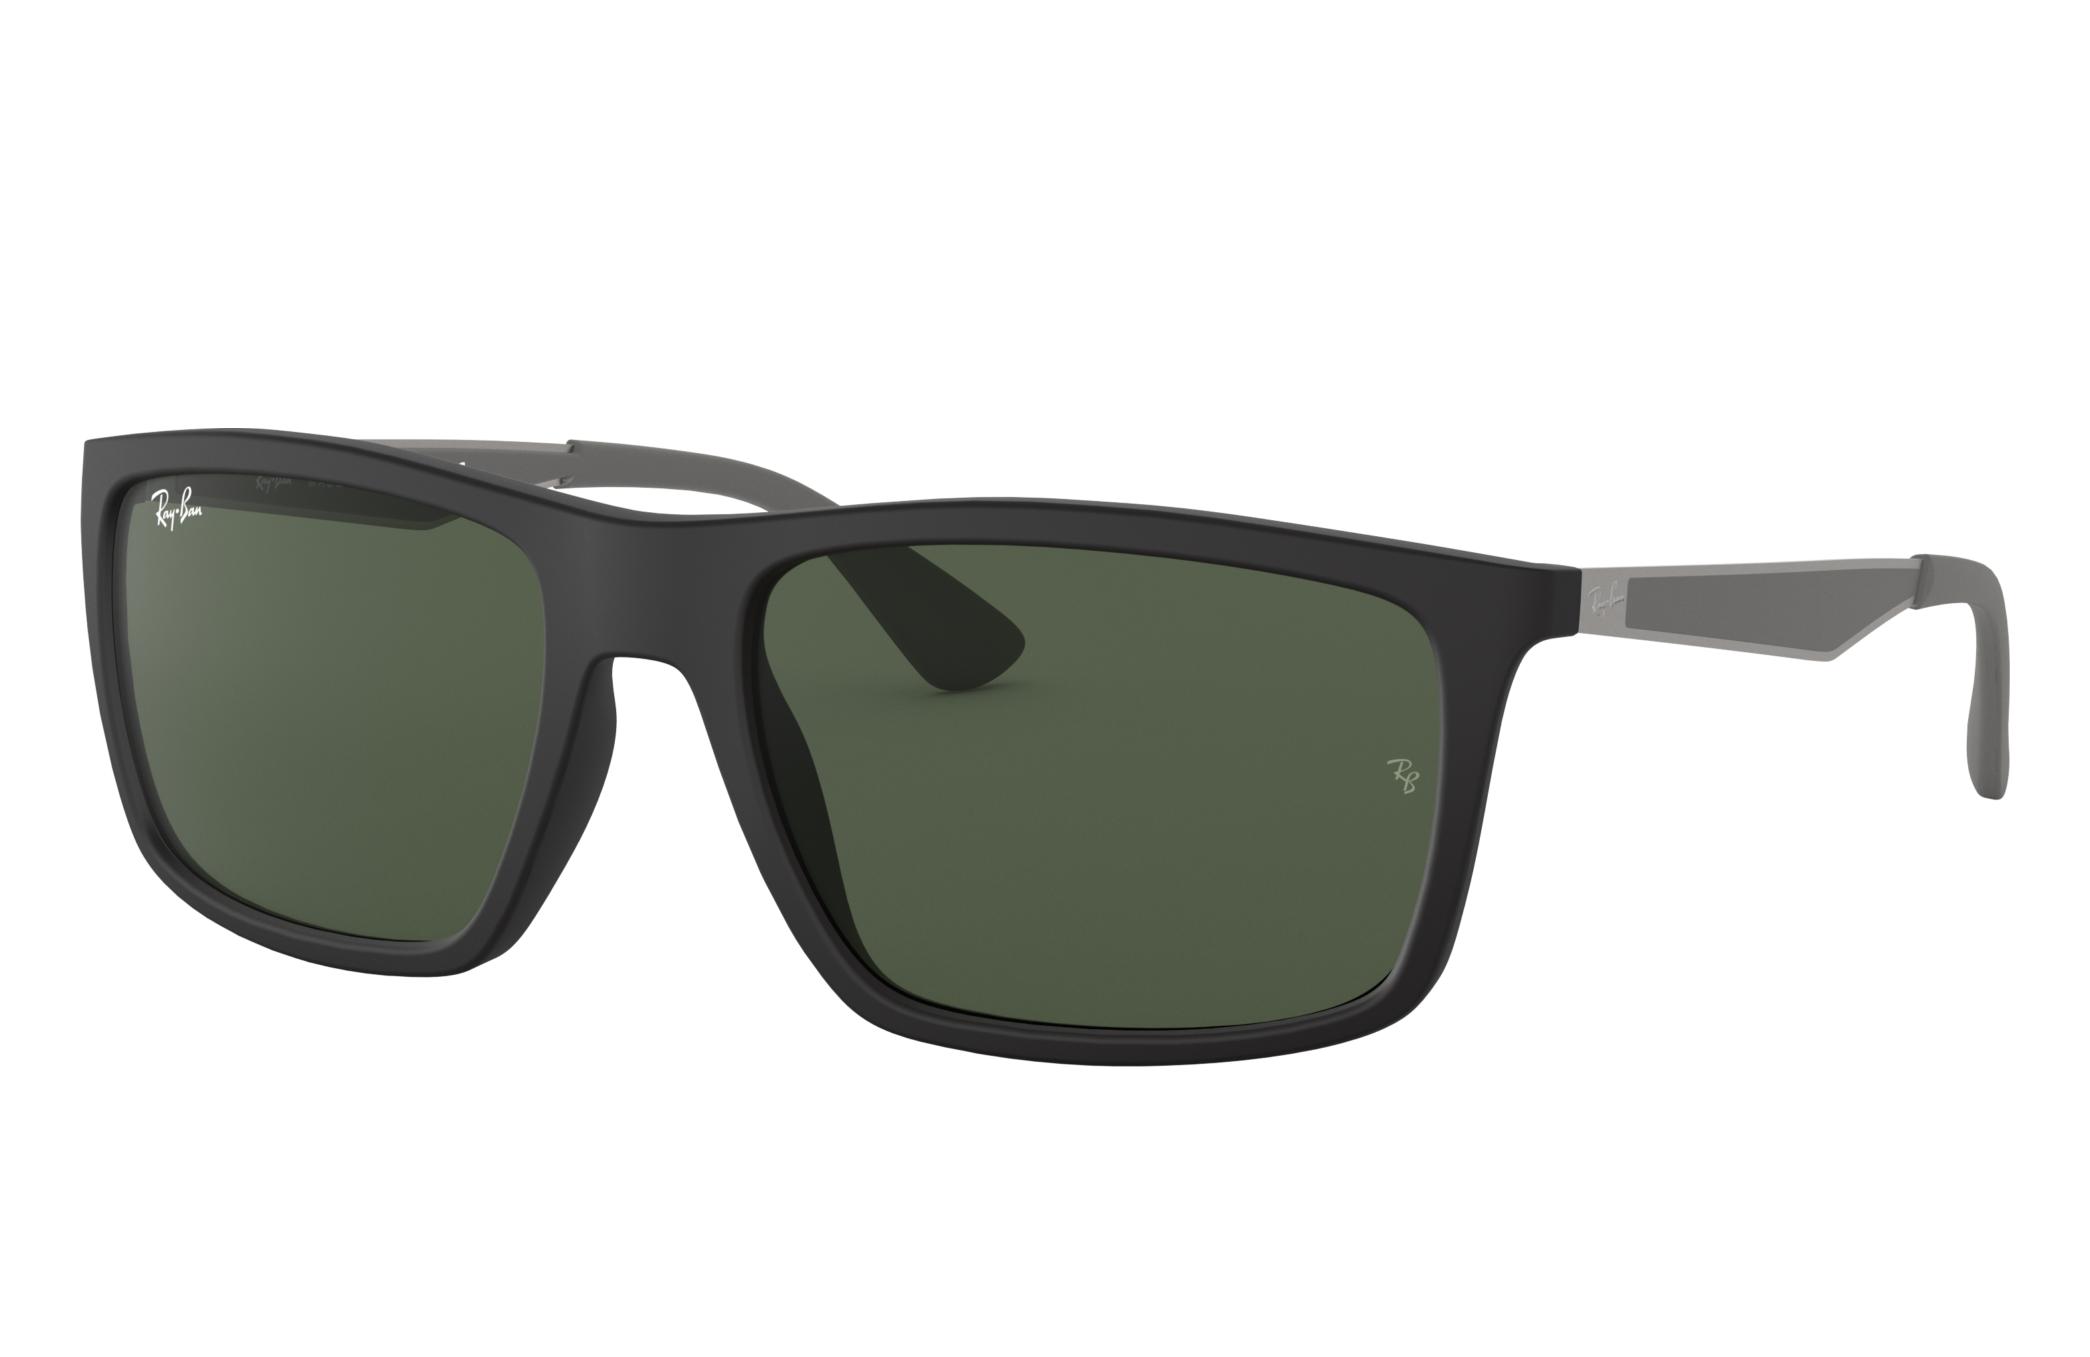 Ray-Ban Rb4228 Gunmetal, Green Lenses - RB4228